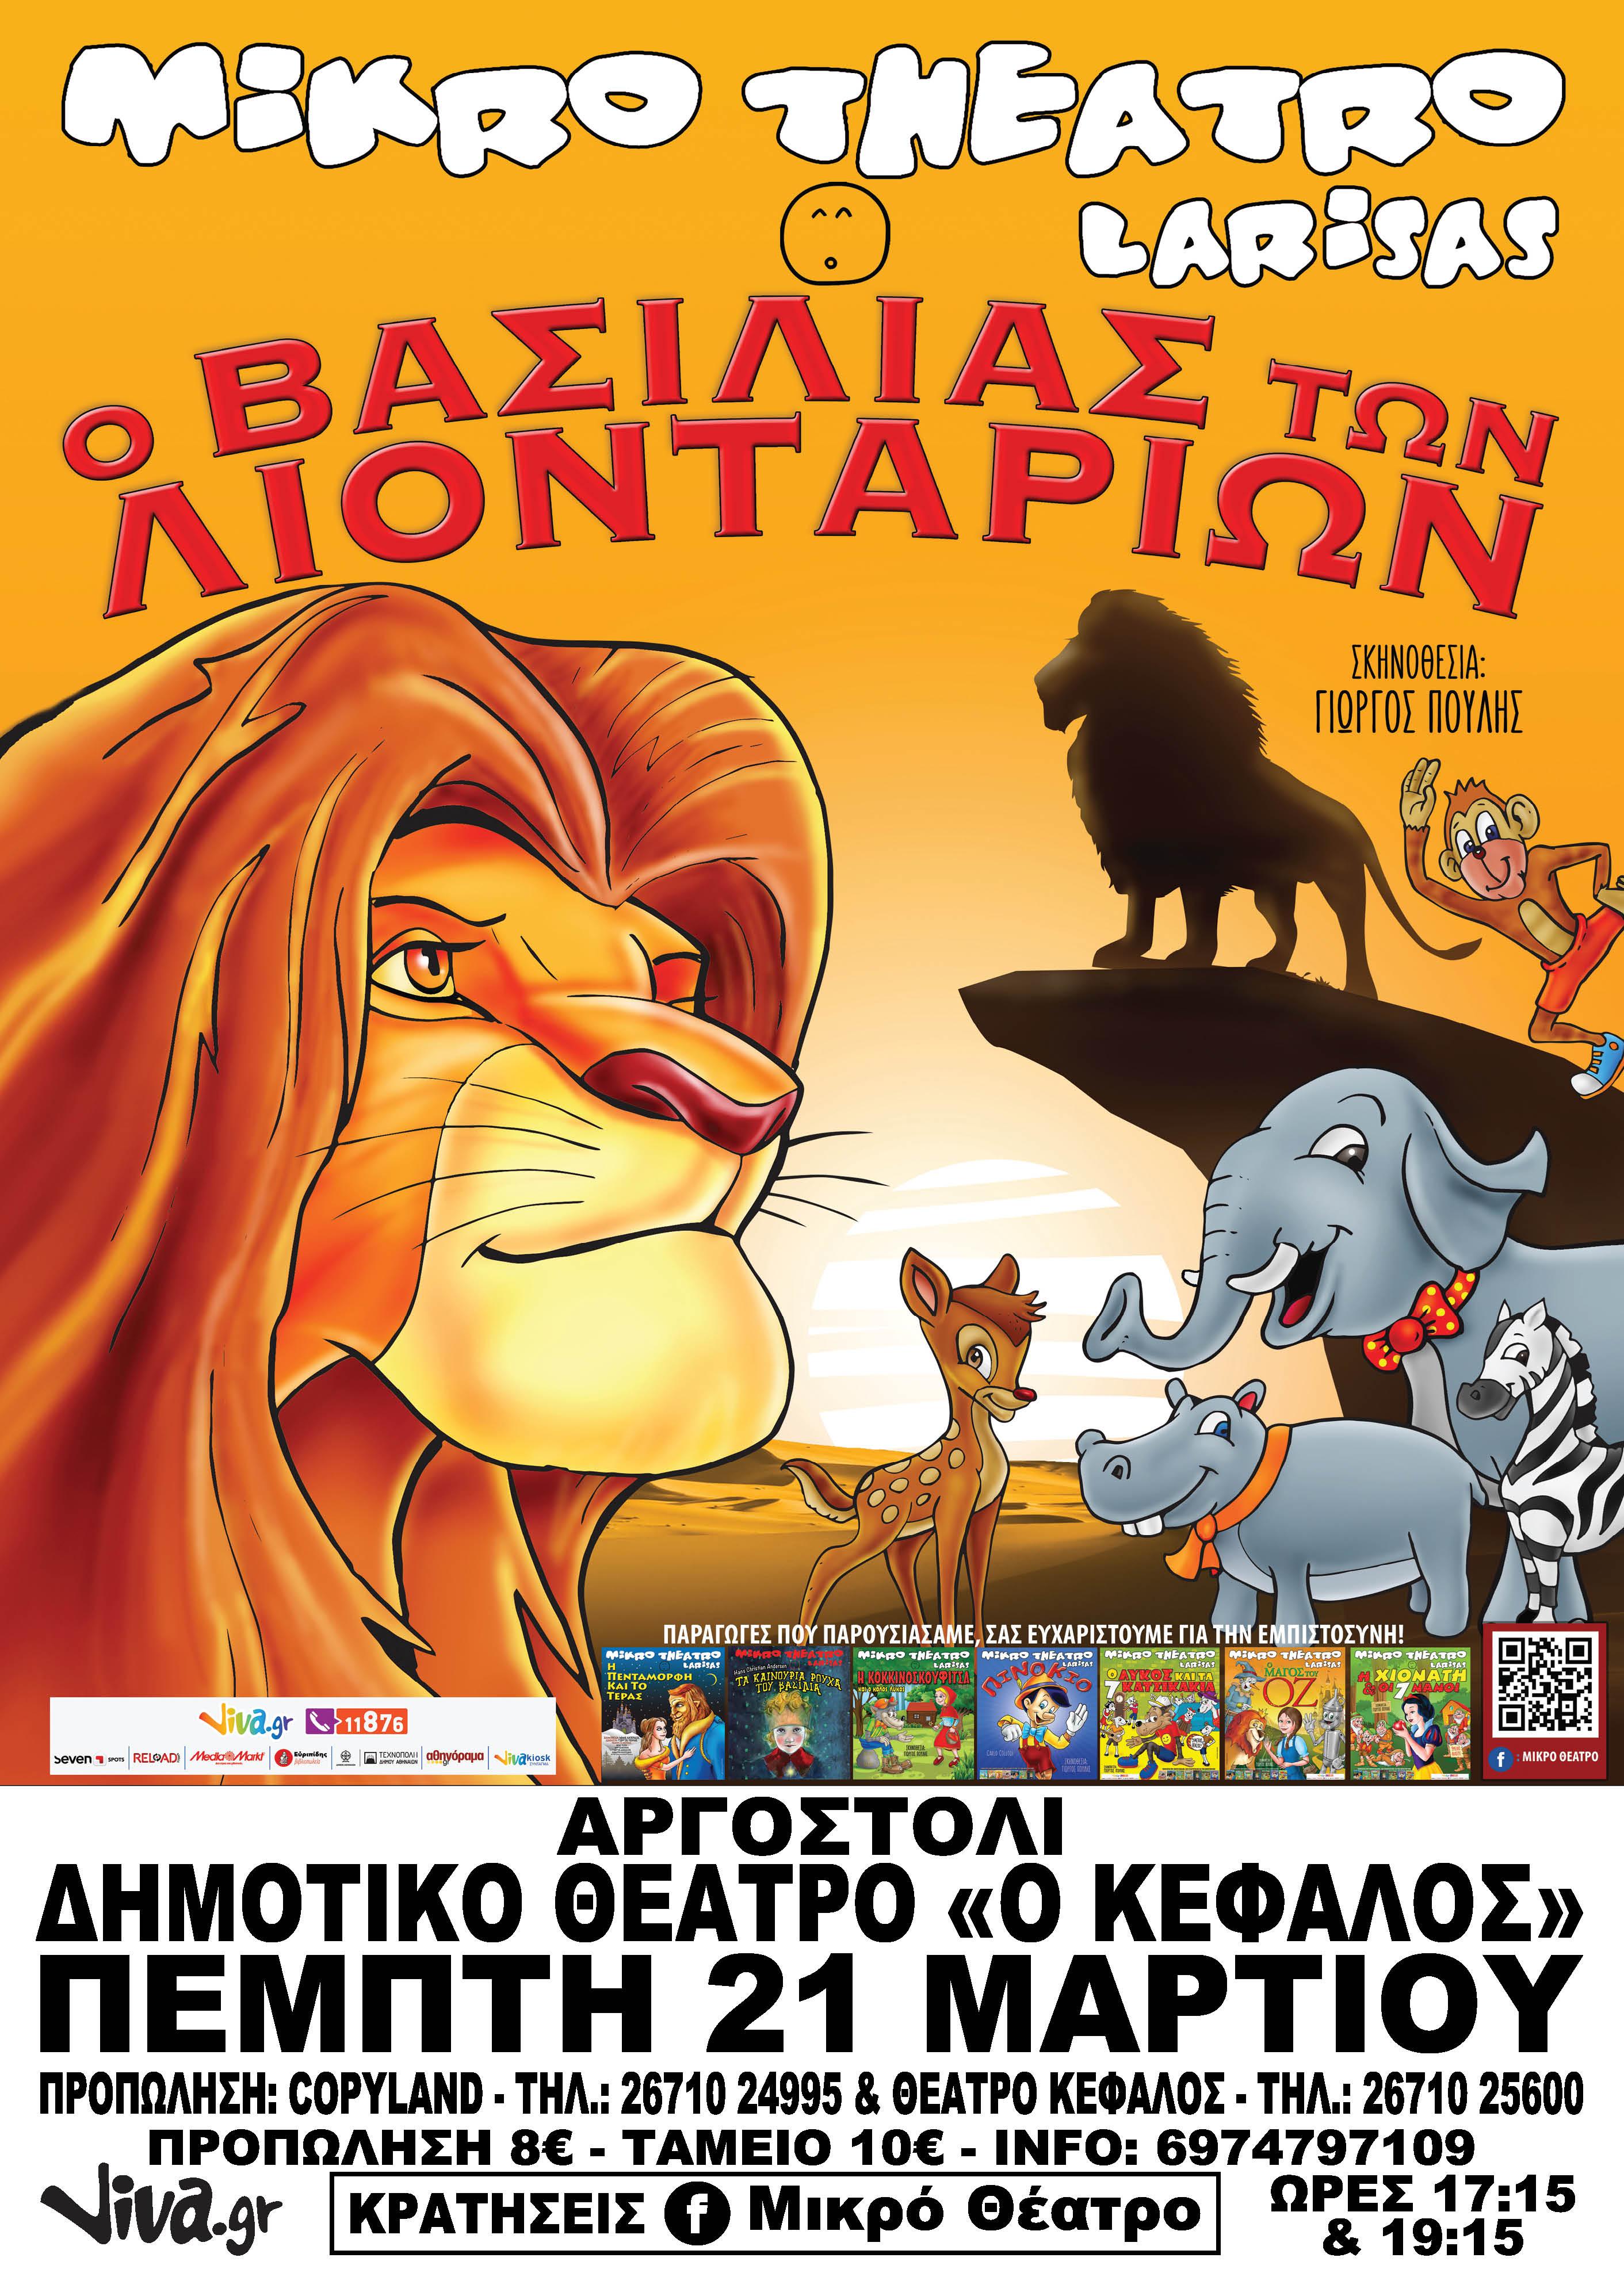 47.8x67.6poster LION ARGOSTOLI